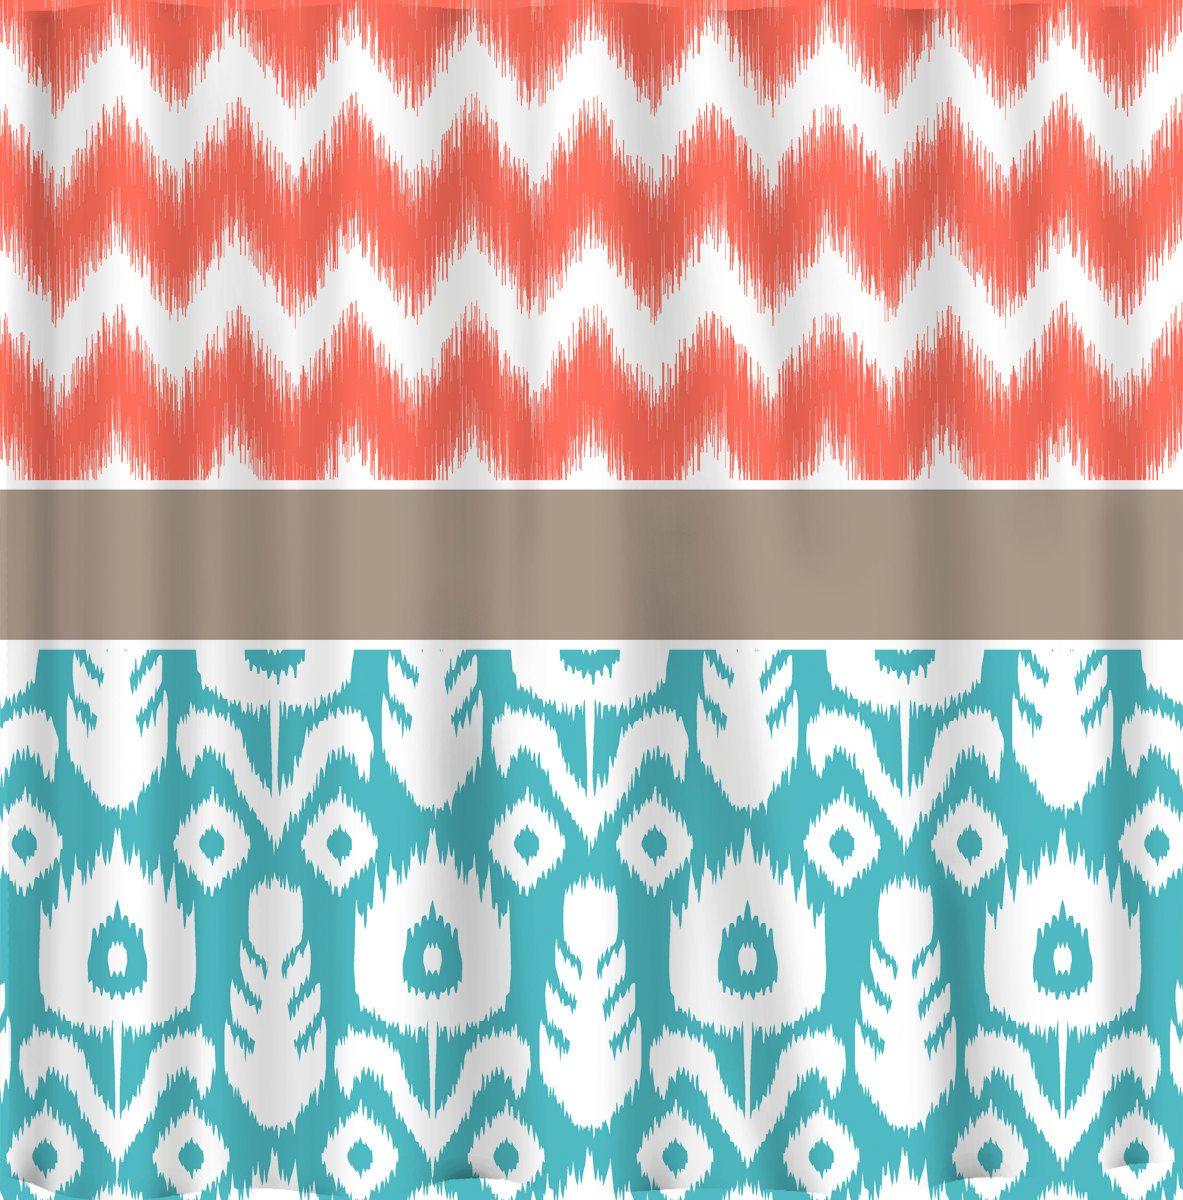 Aqua chevron shower curtain - Turquoise And Orange Shower Curtain 17 Best Images About Shower Curtains On Pinterest Chevron Shower